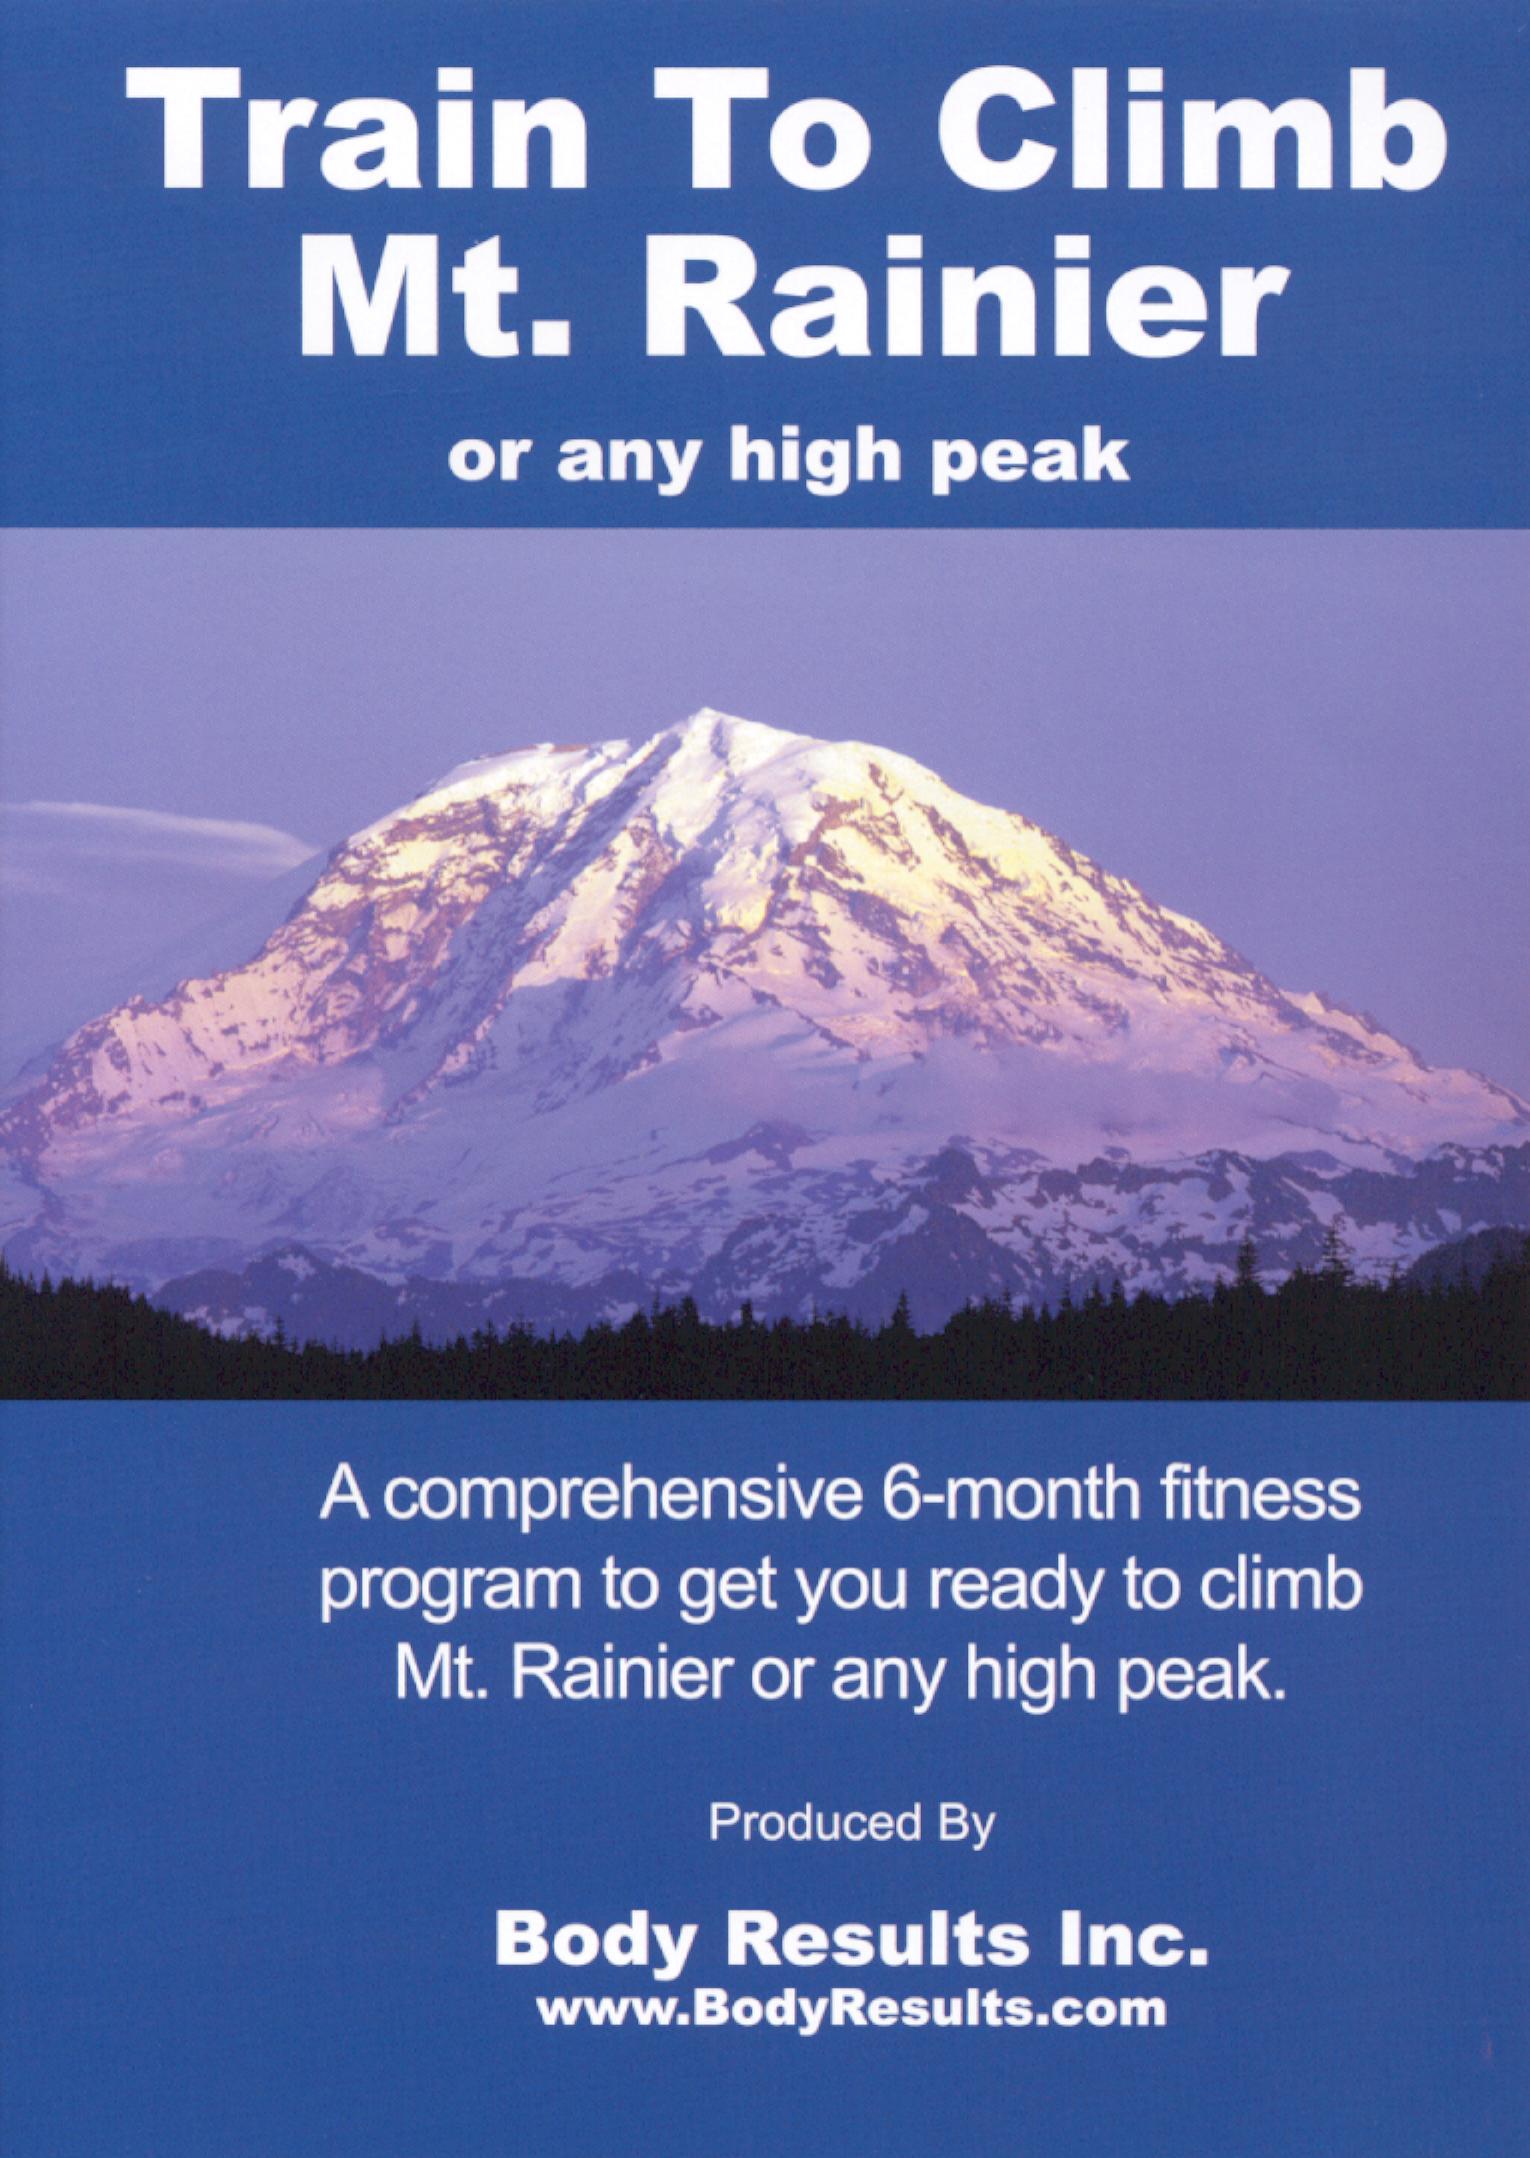 Train To Climb Mt. Rainier